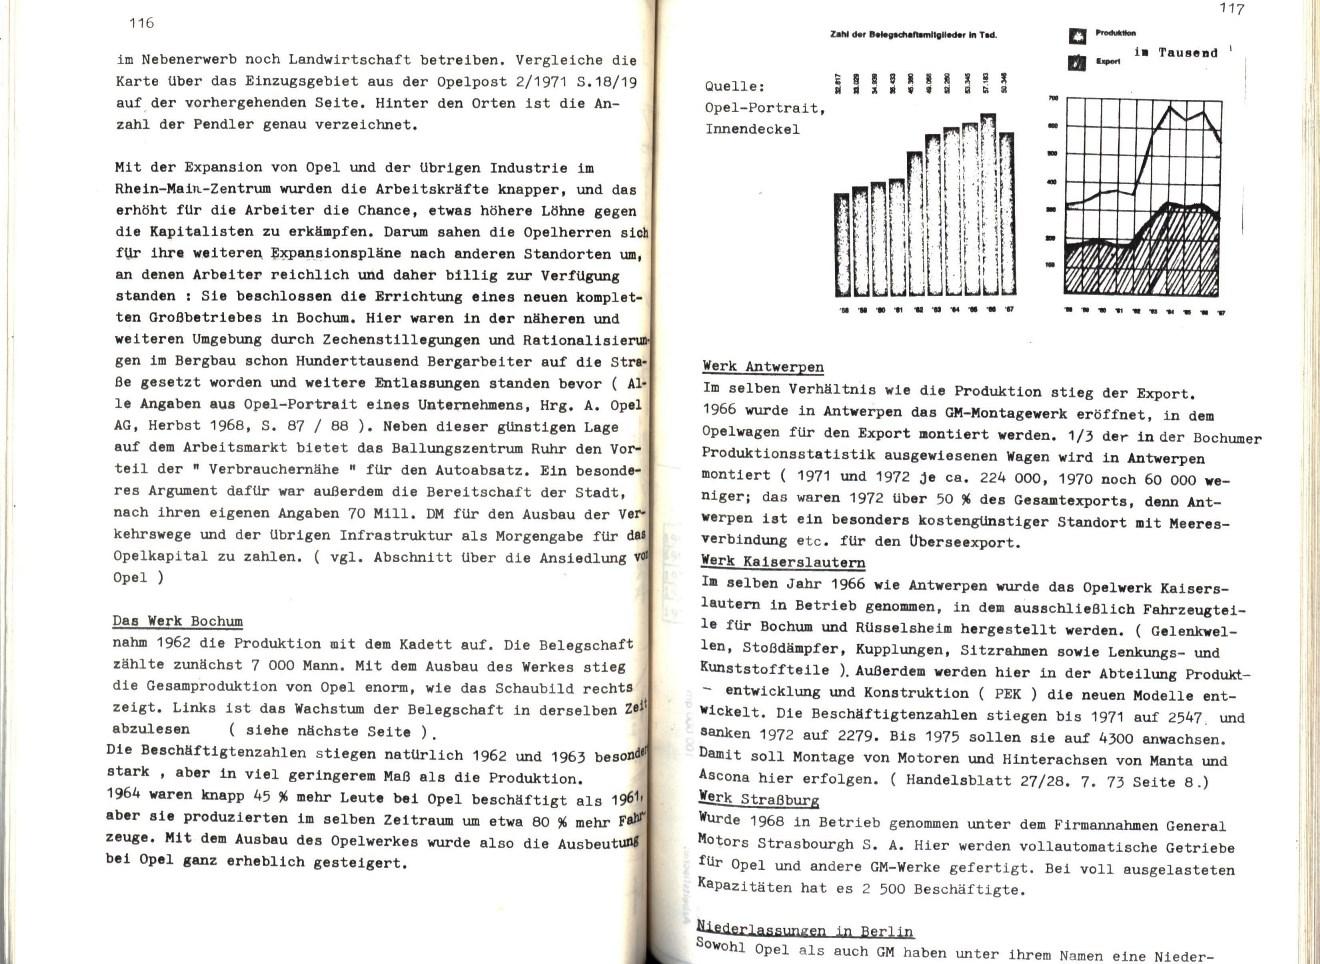 Bochum_IGM_Opel_PG_Opel_streikt_1973_060